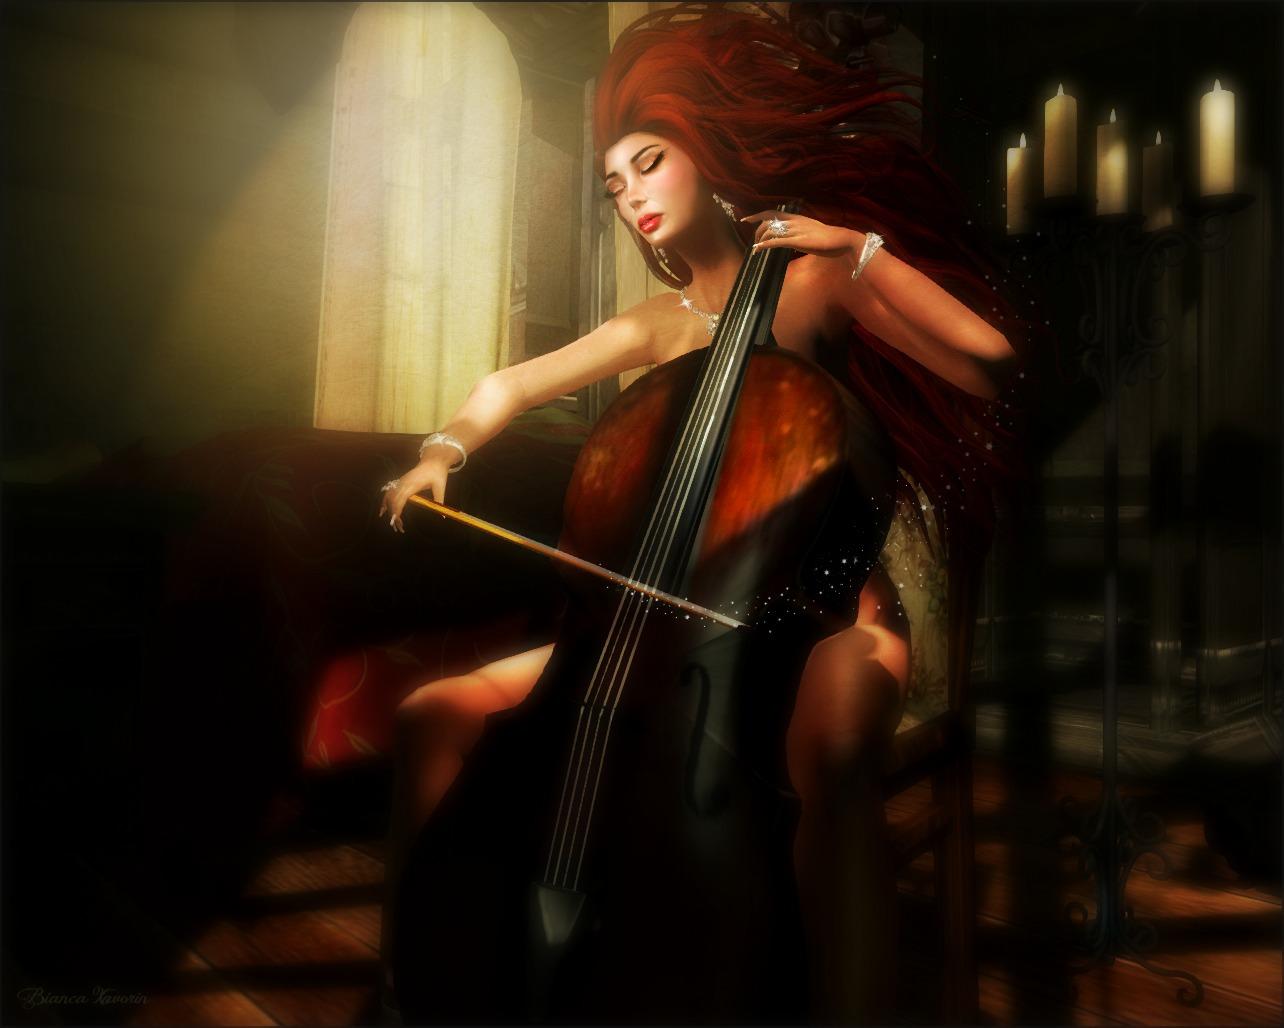 Cello Wallpaper Photo 22287 Hd Pictures: Wallpaper : Cello, Music, Redhair, Second, Life, Romantic